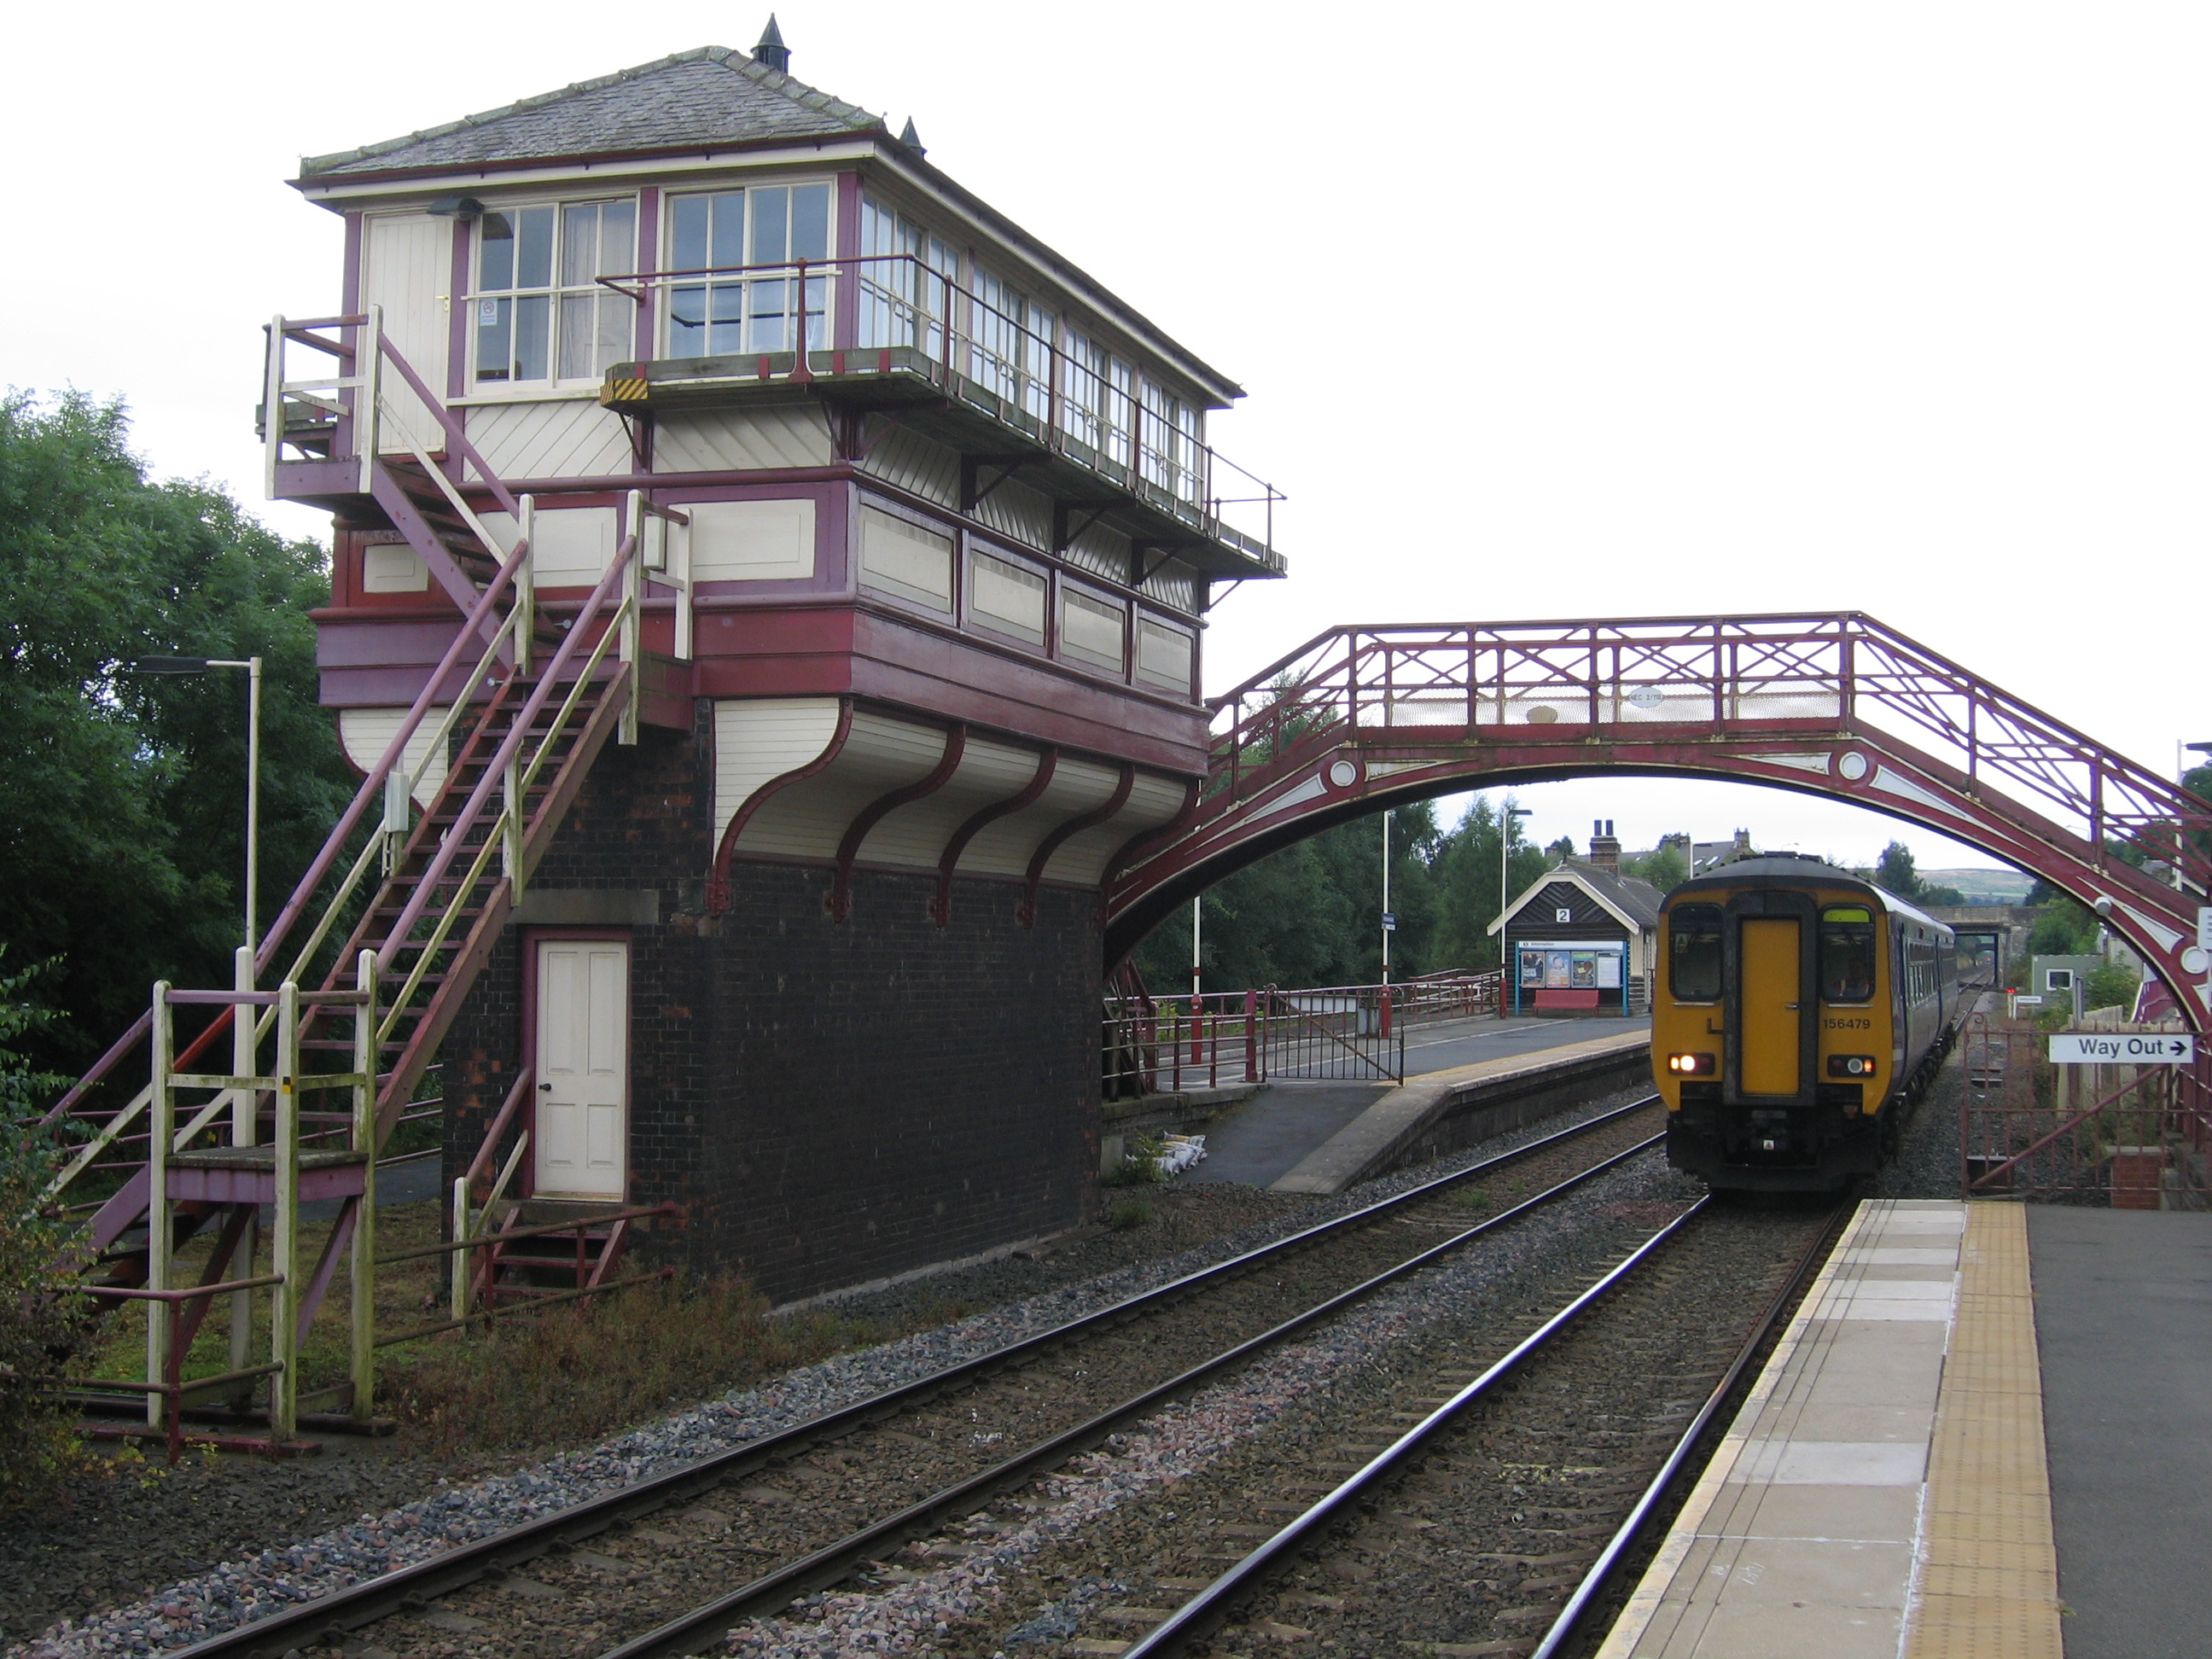 2 Newcastle Line. Stocksfield Corbridge Riding Mill Railway Station Photo